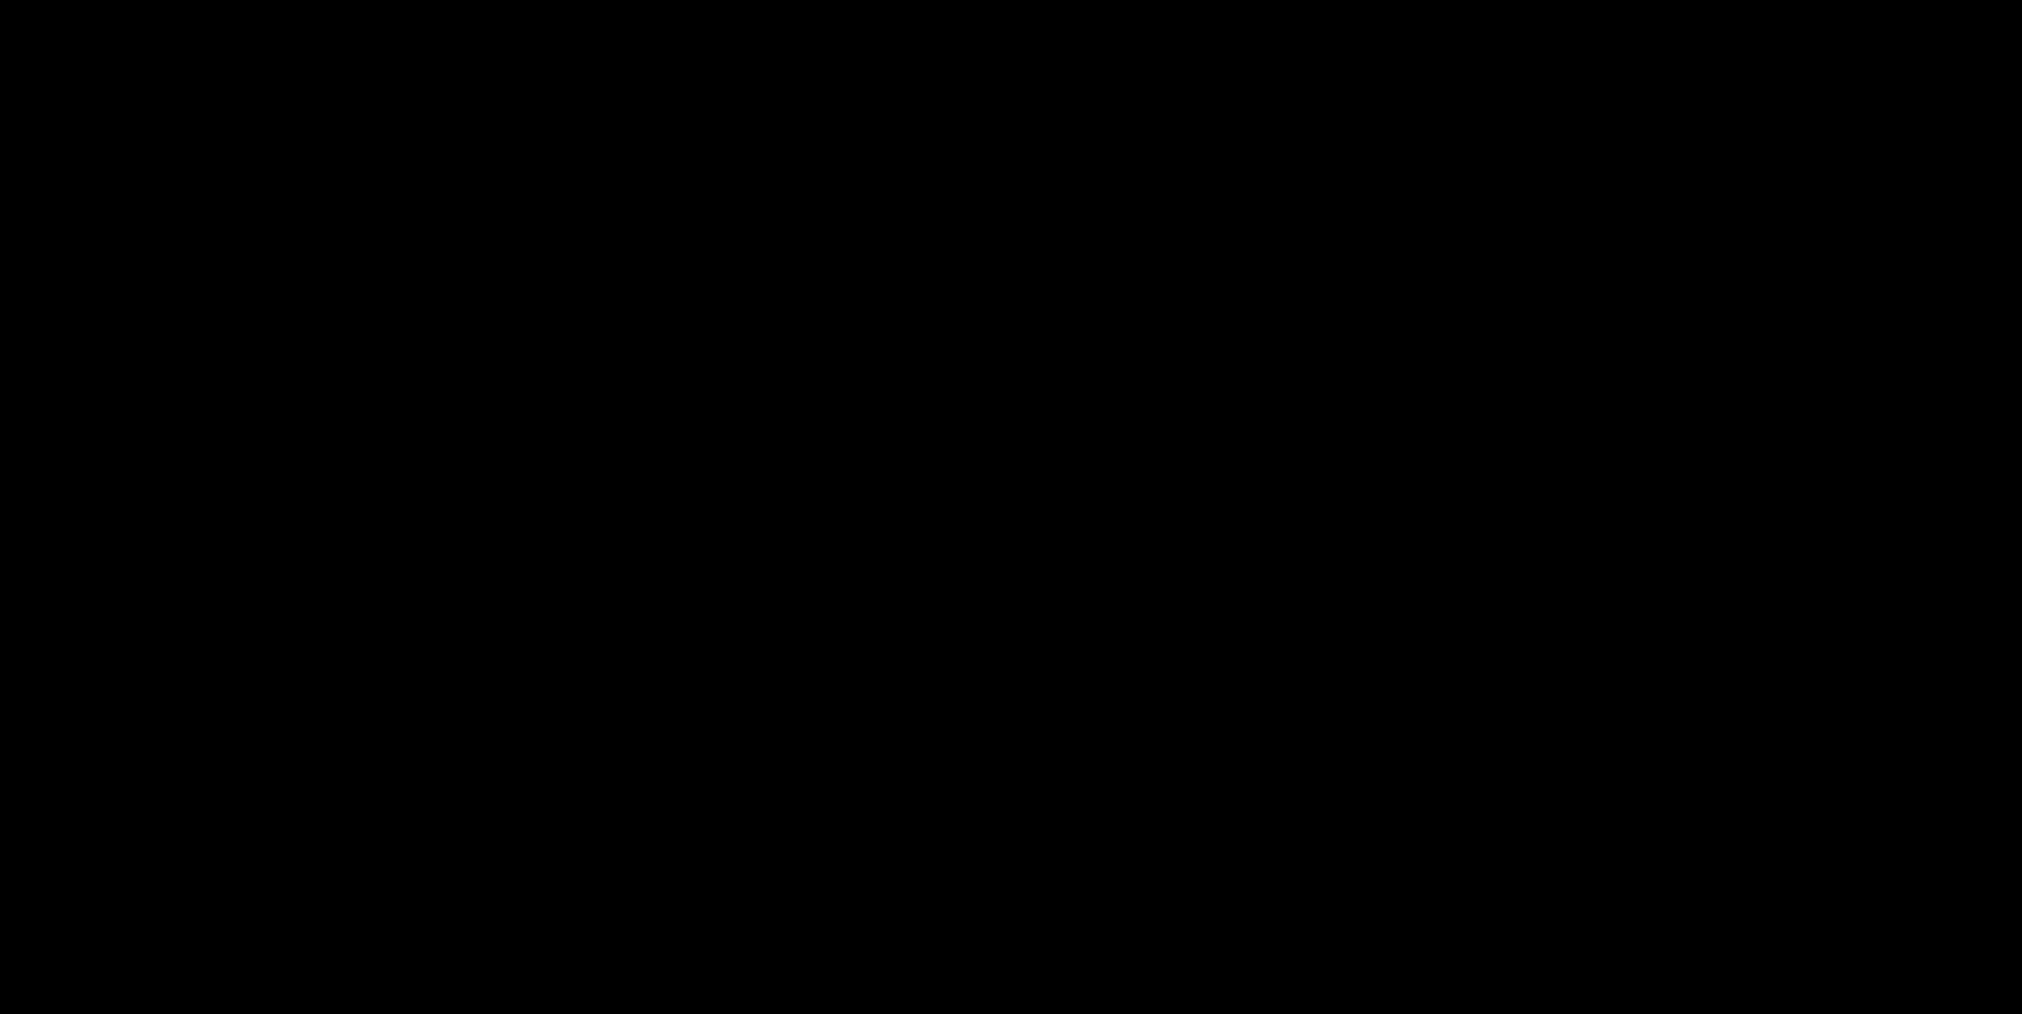 CNB-001